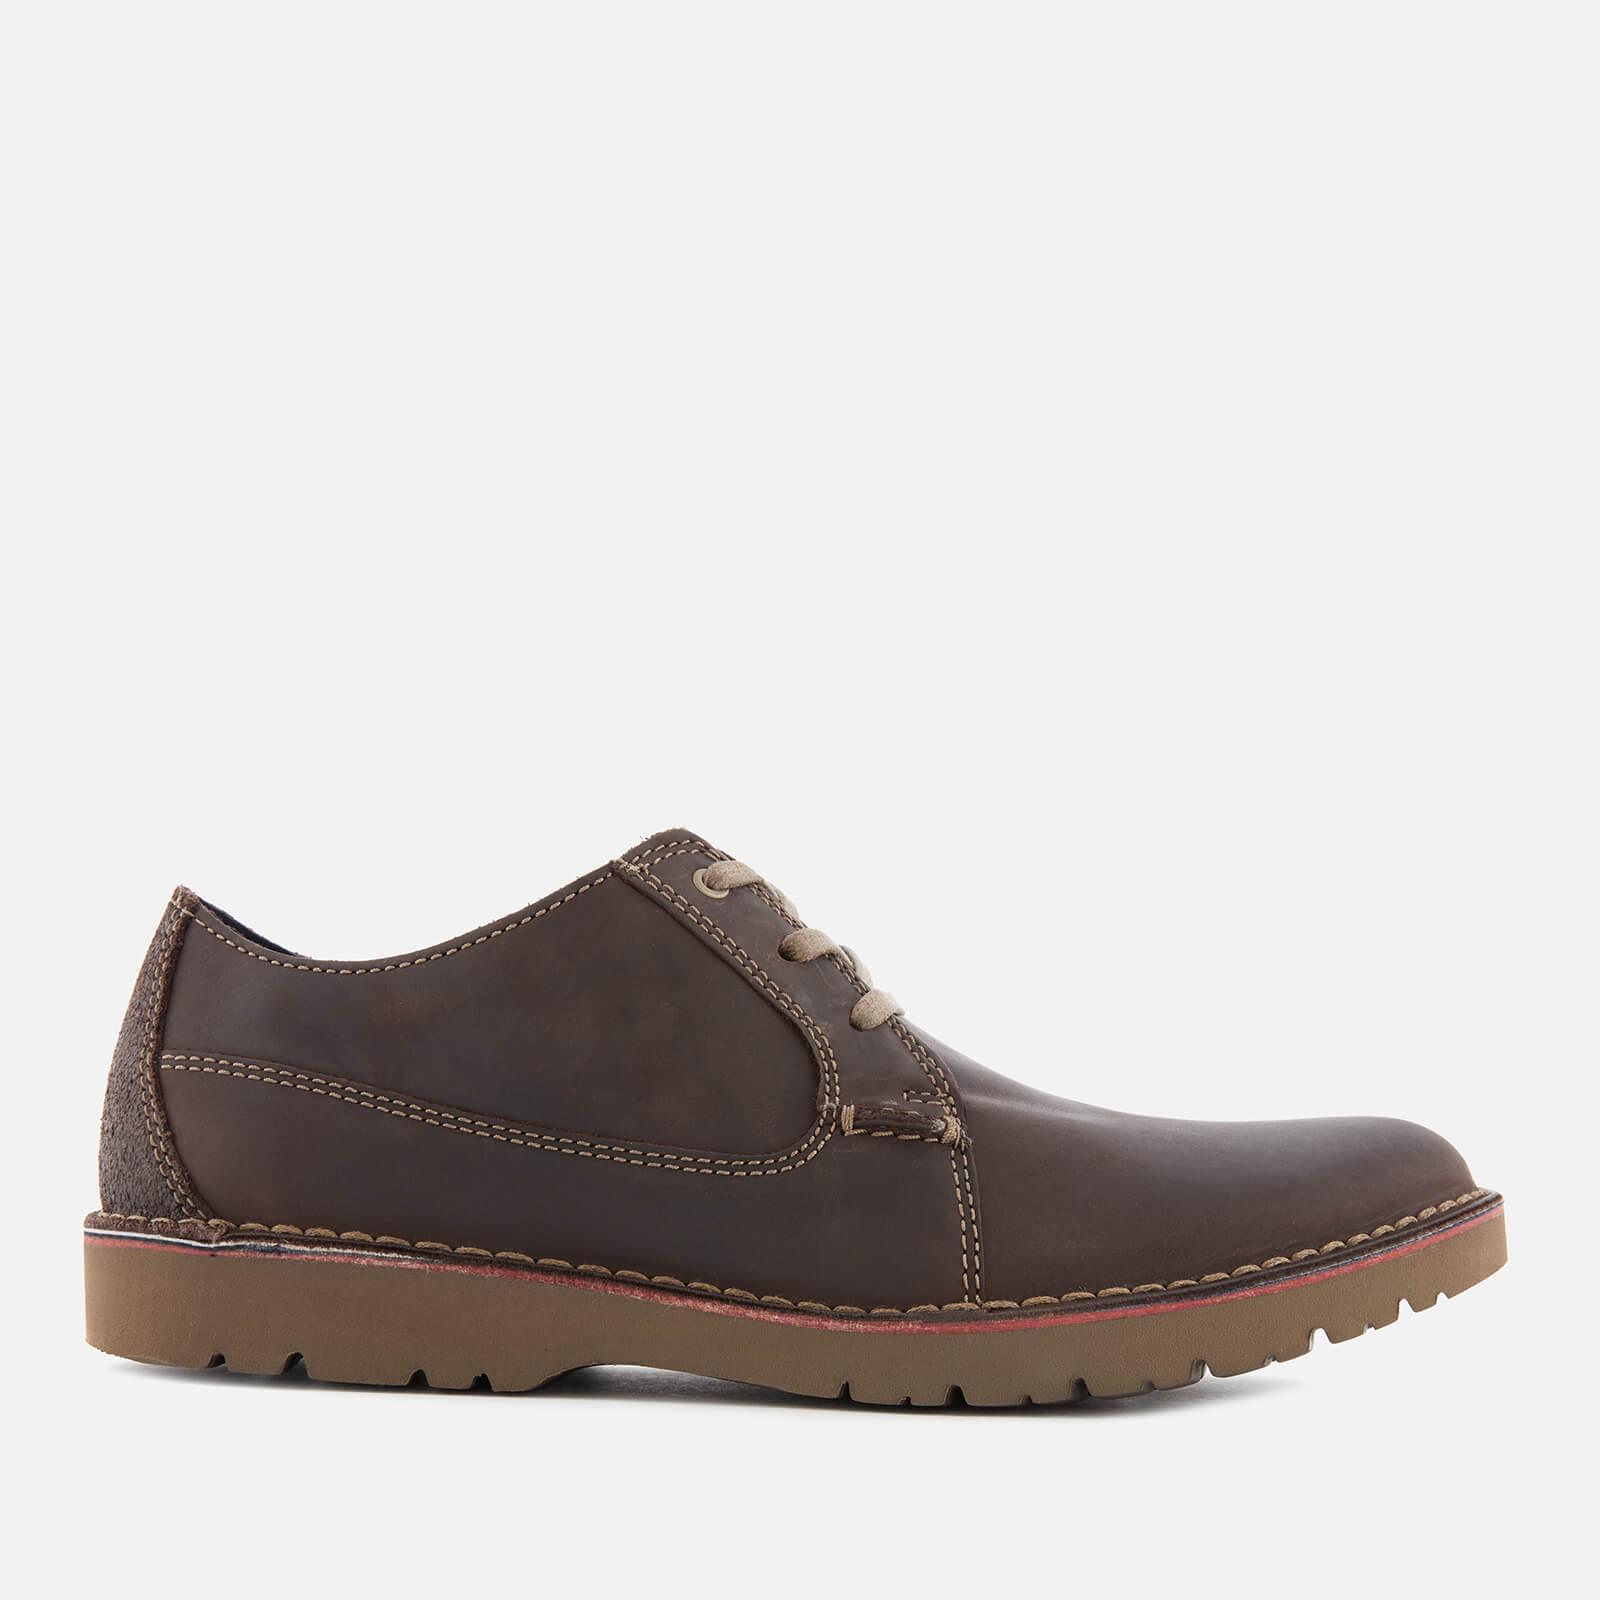 Clarks Men's Vargo Plain Leather Derby Shoes - Dark Brown - UK 9